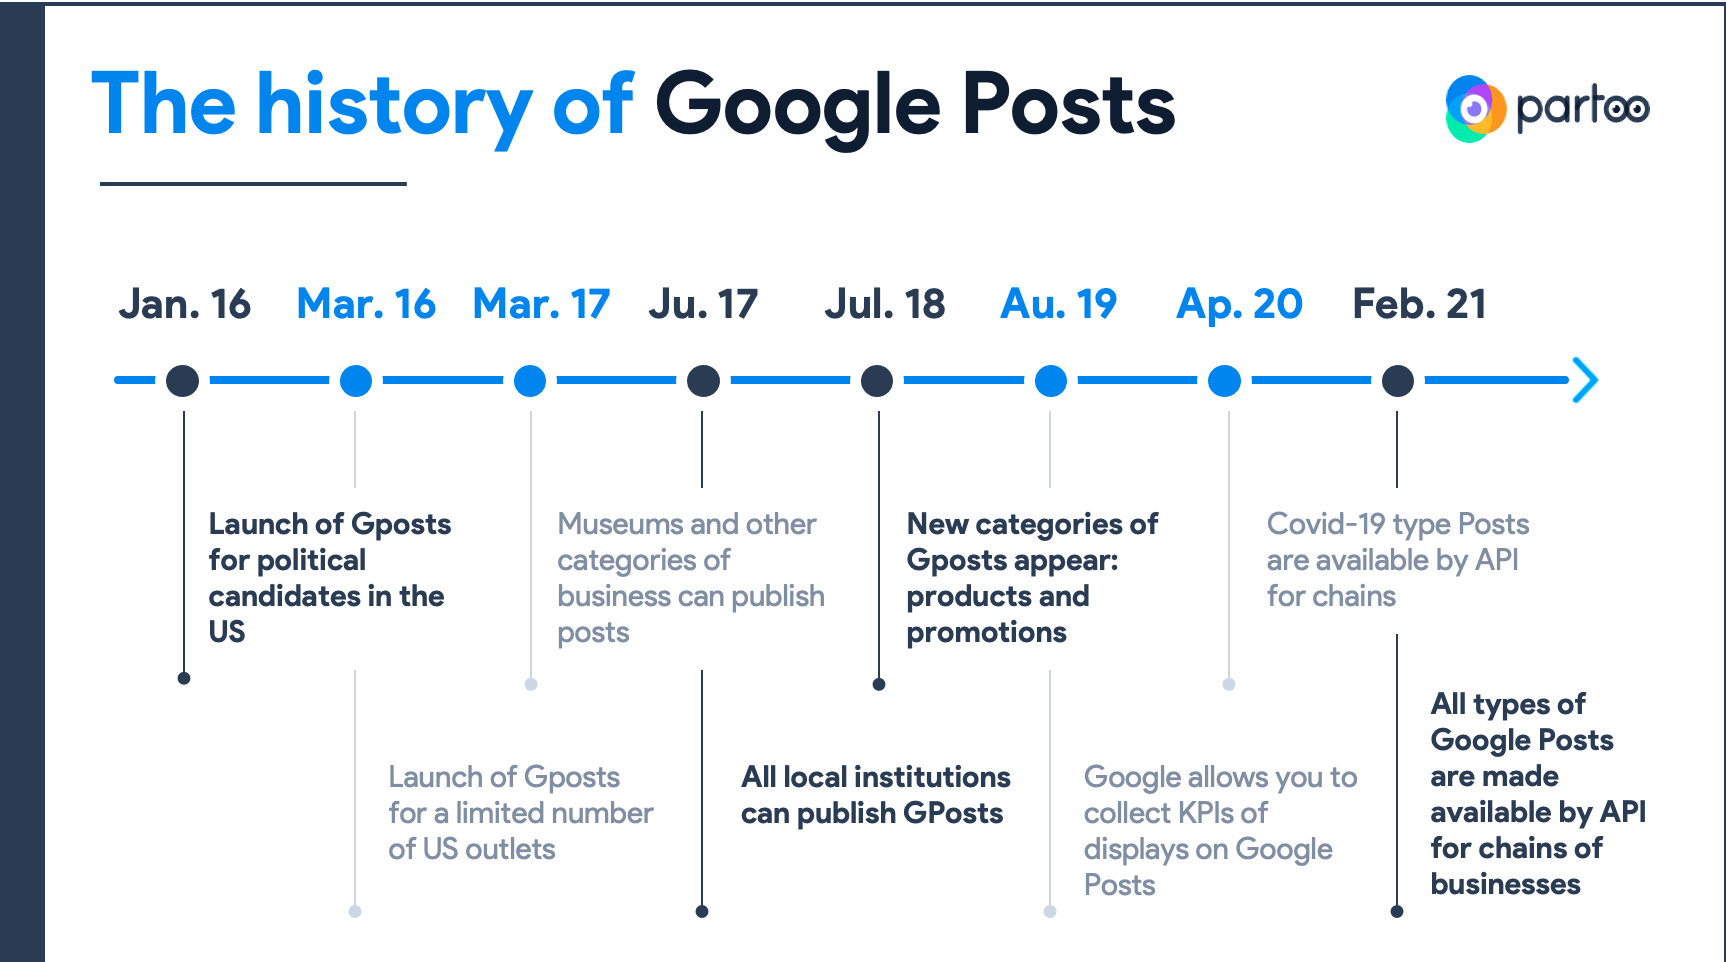 History of Google Posts